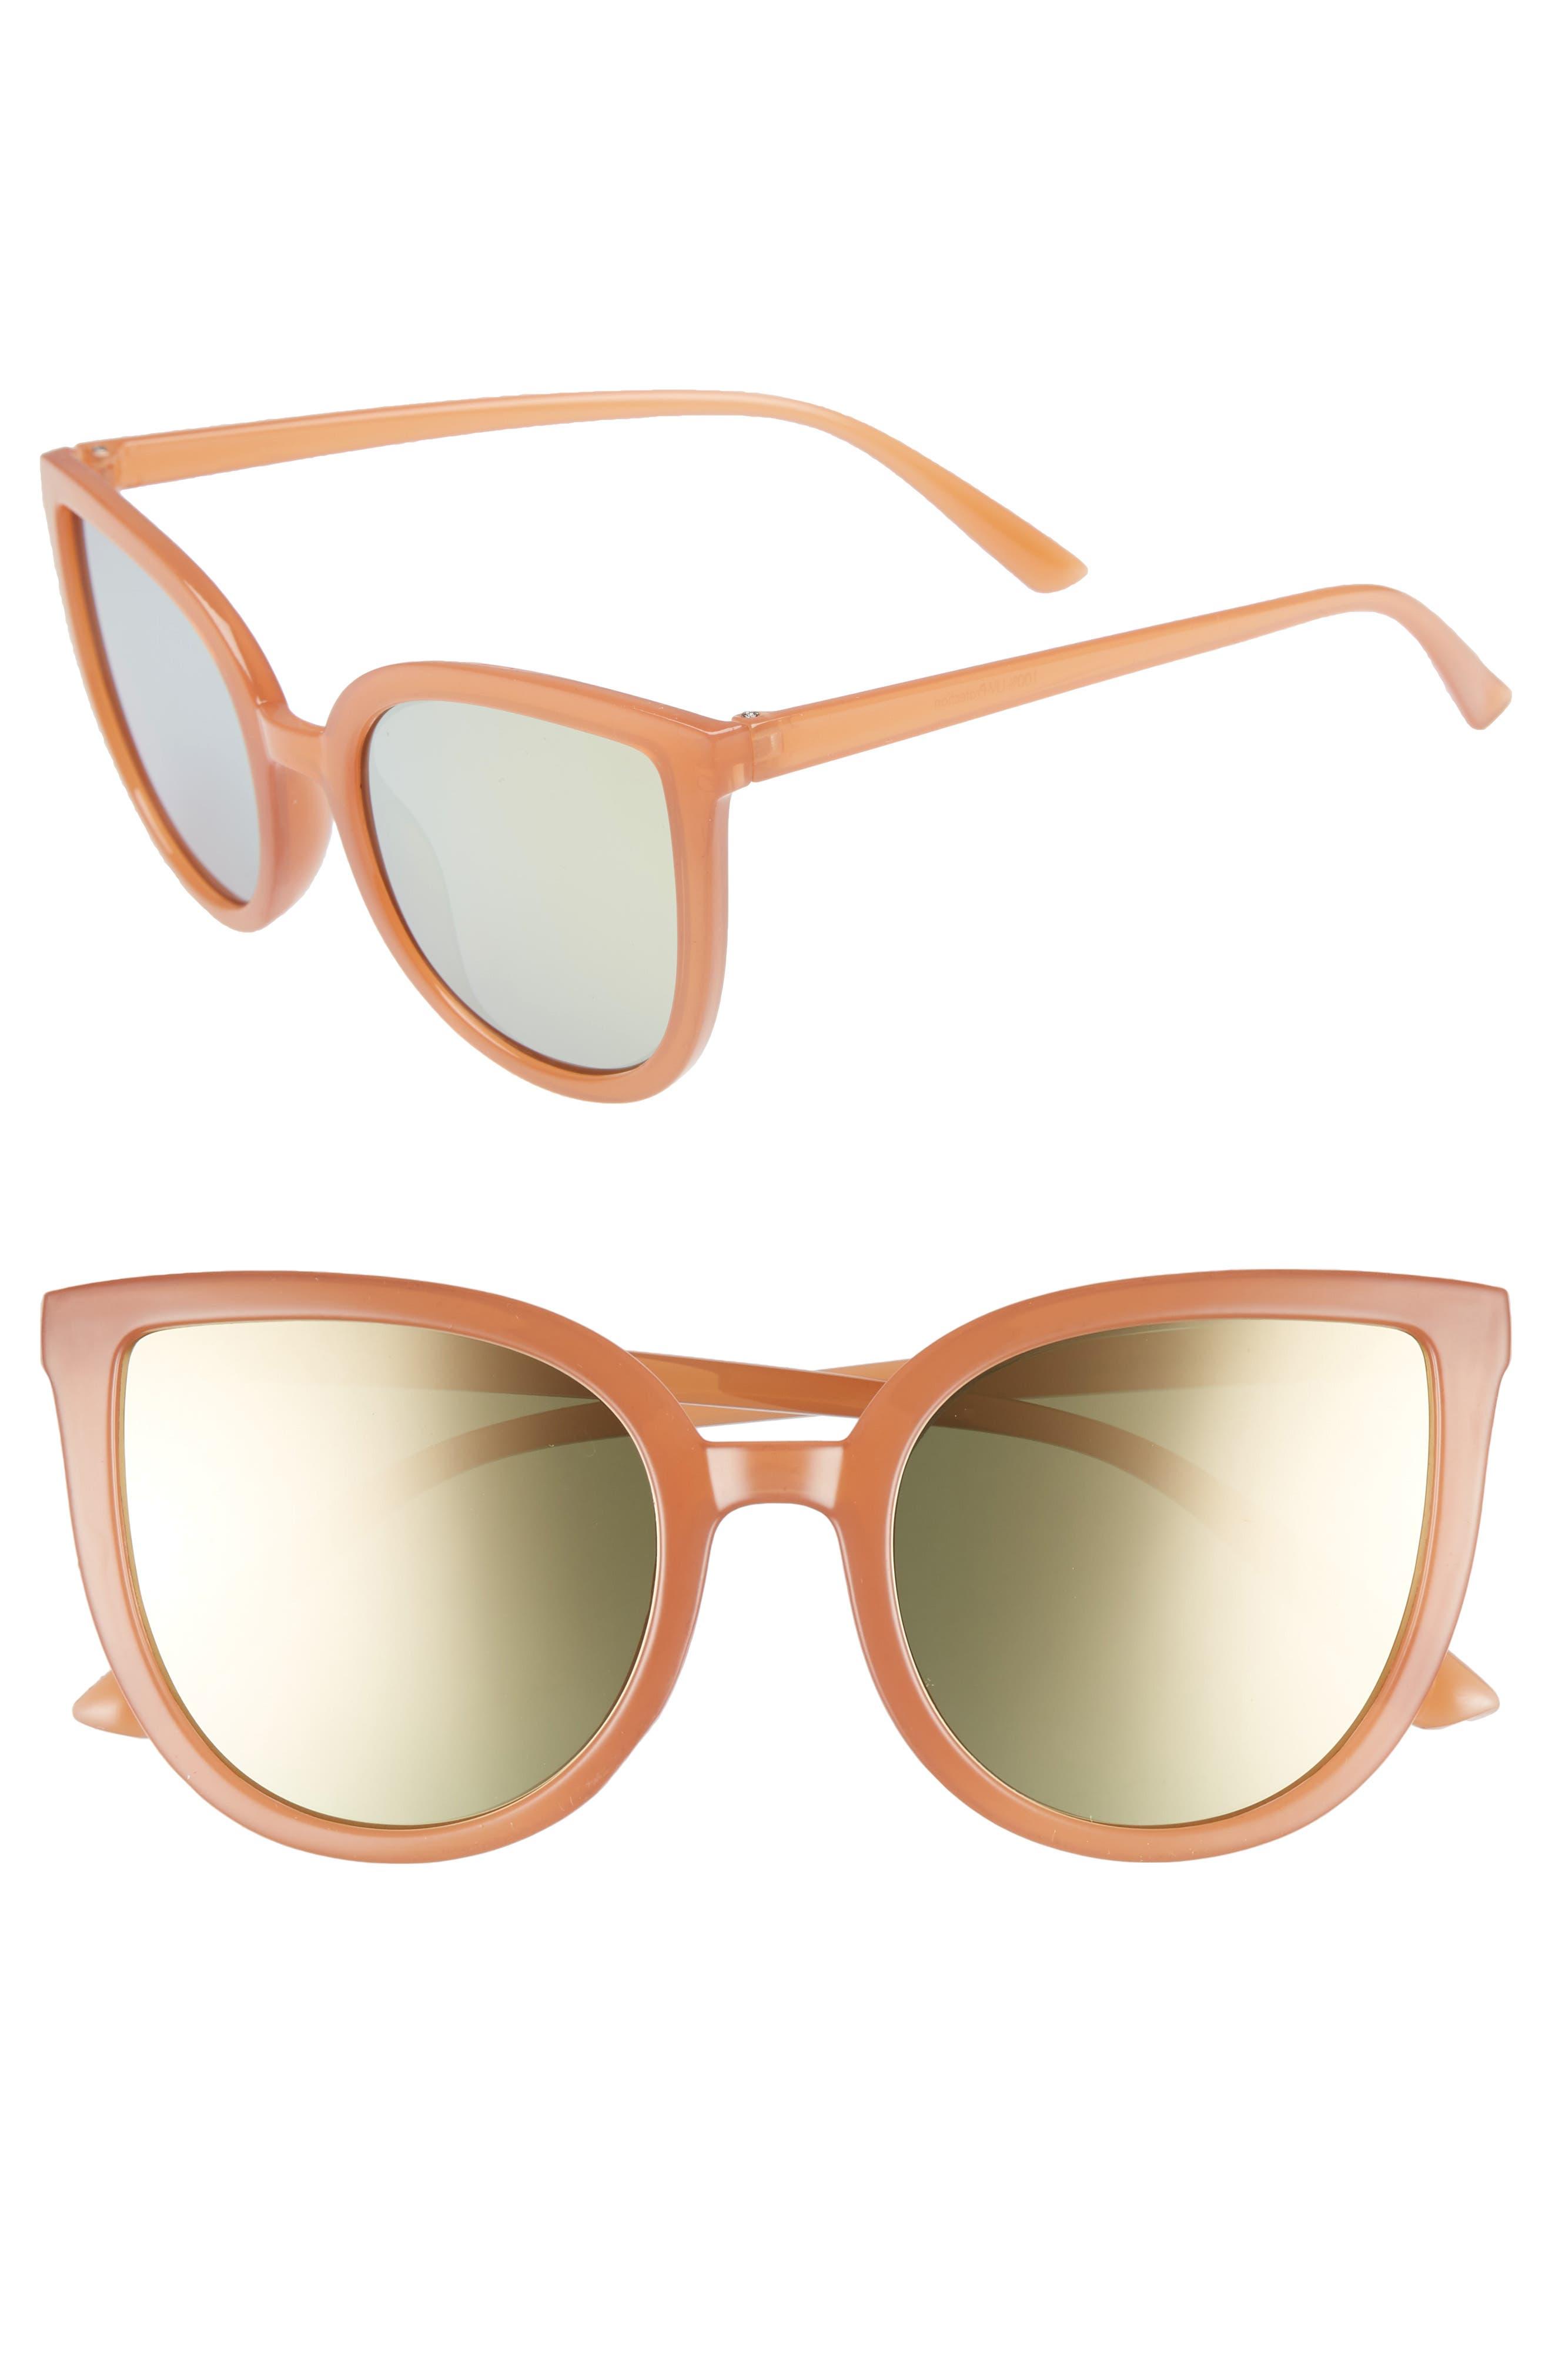 Thin Cat Eye Sunglasses,                             Main thumbnail 1, color,                             Milky Peach/ Gold